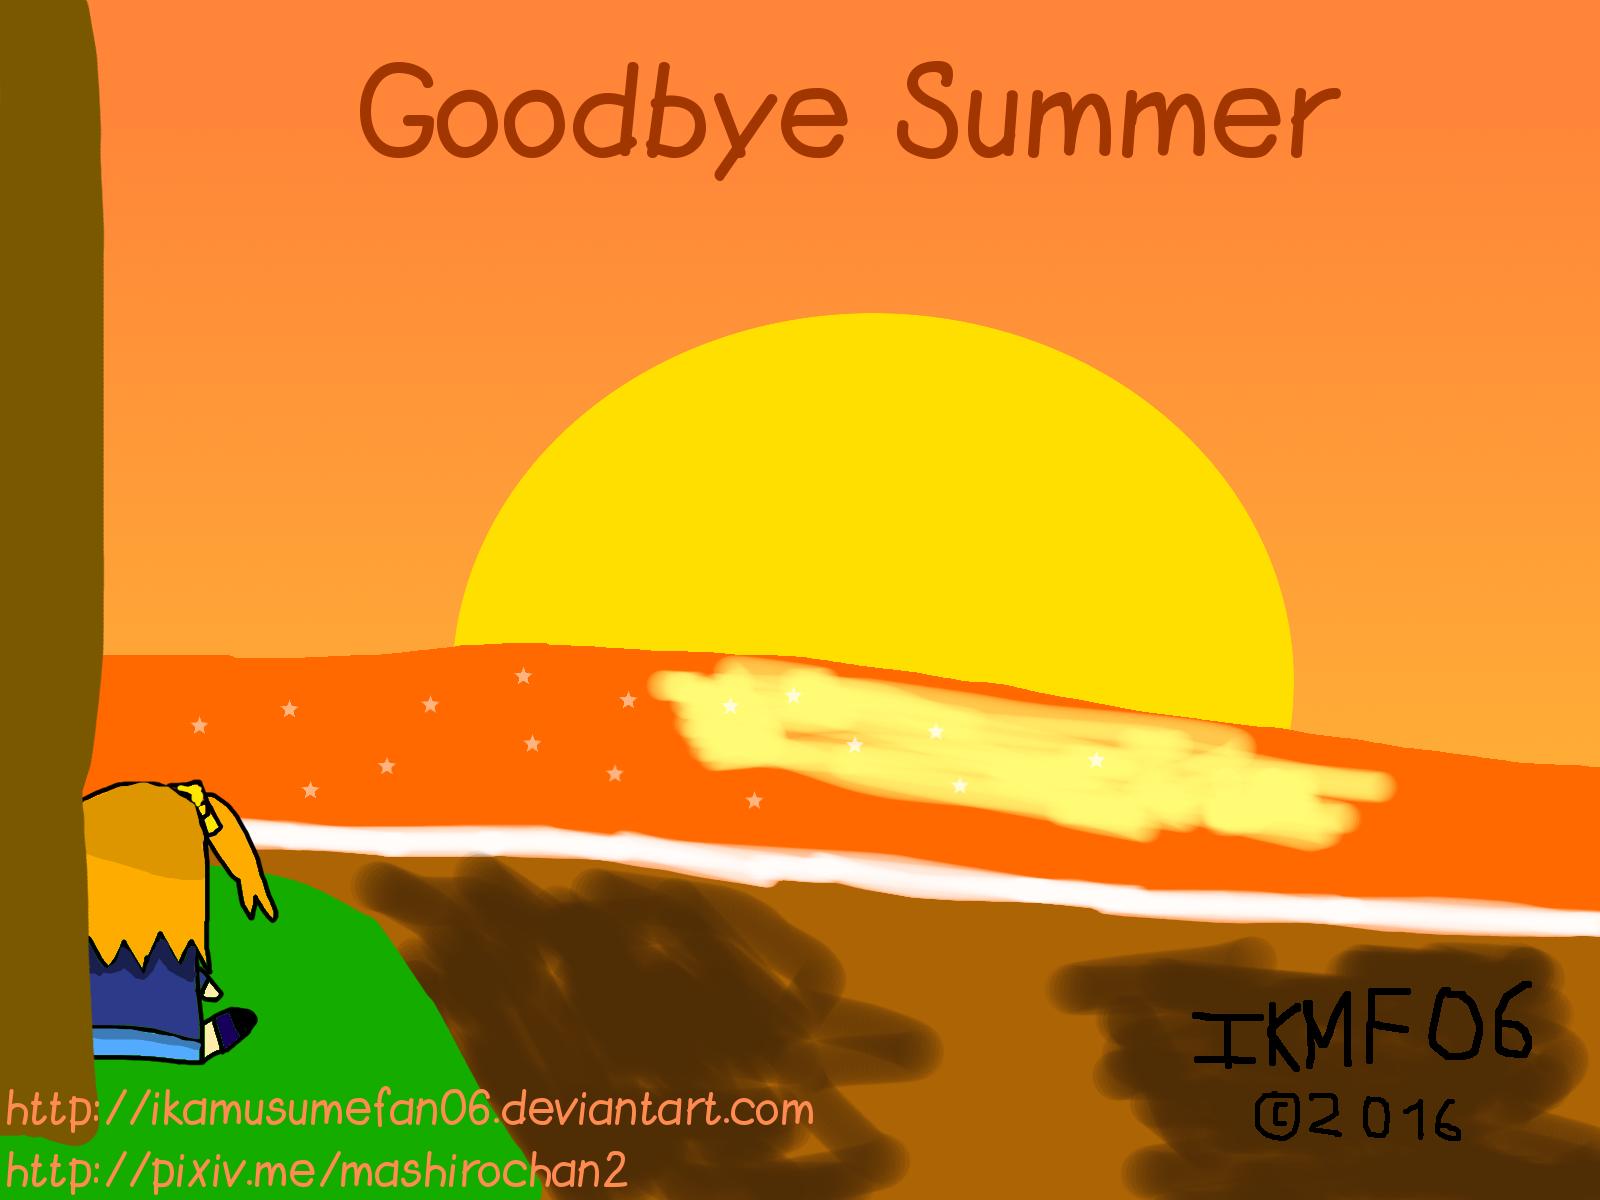 Goodbye Summer - The Fall Breeze is Coming by IkaMusumeFan06 on DeviantArt